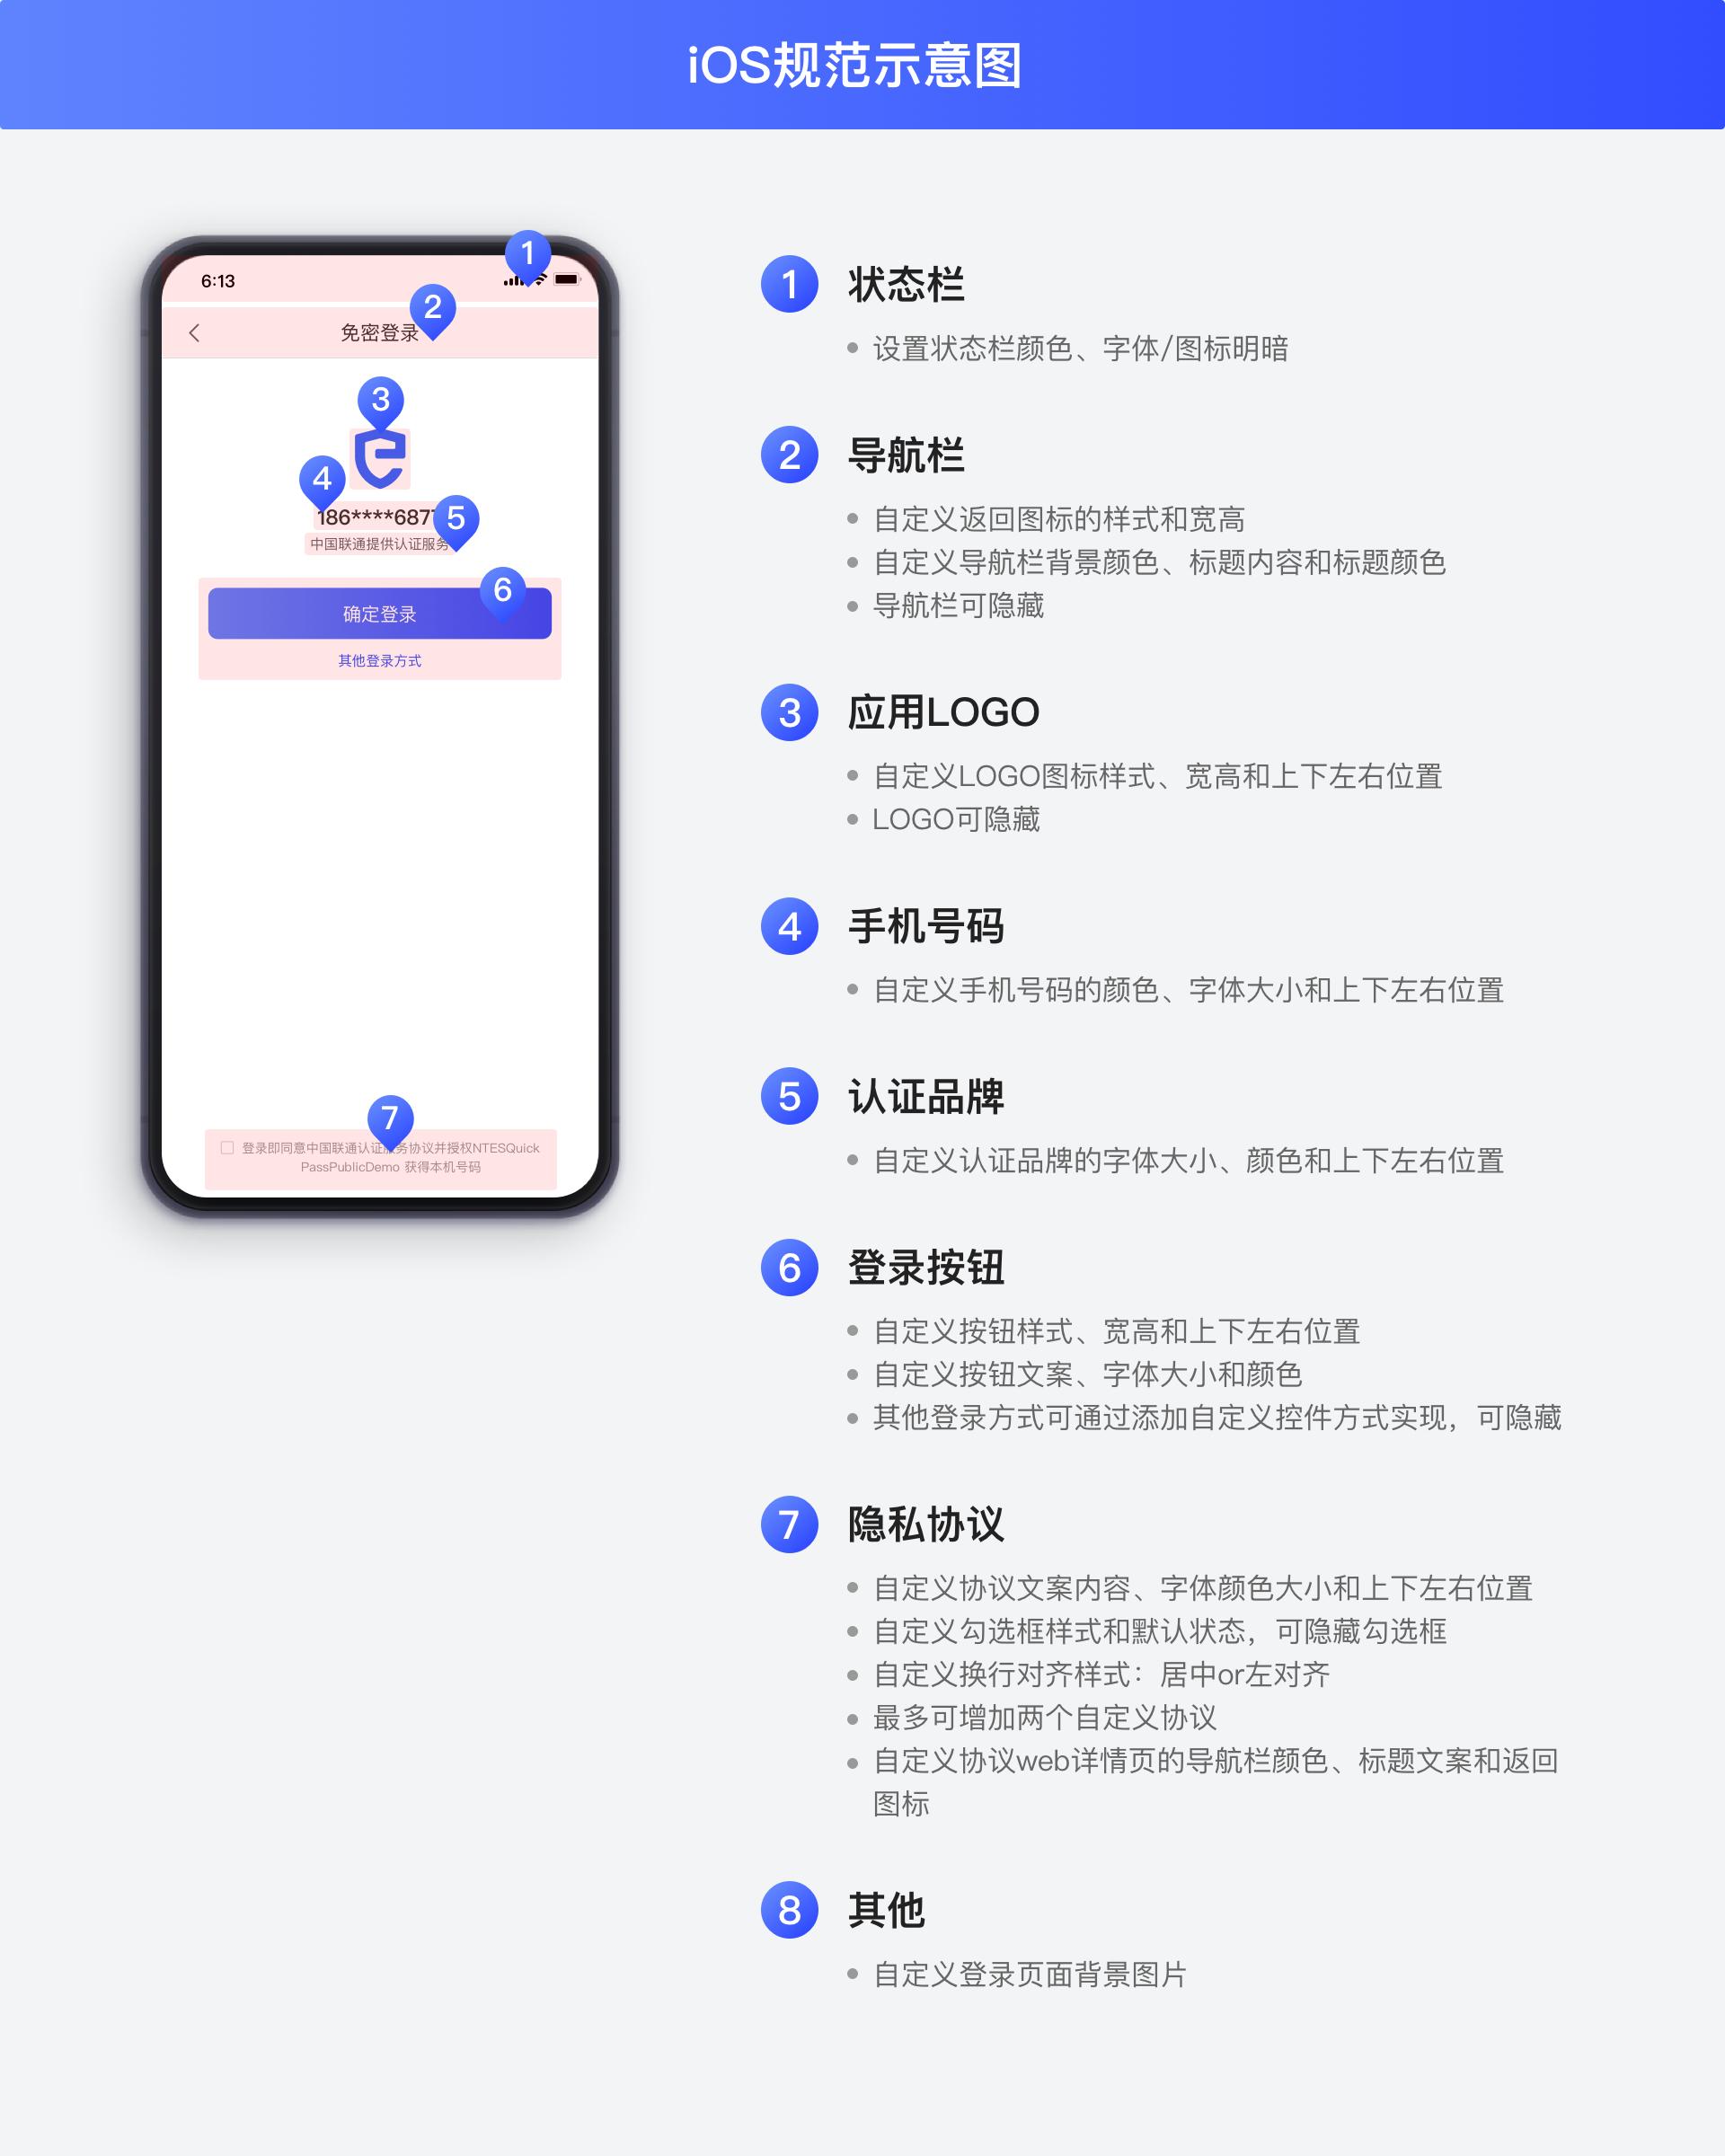 iOS设计规范